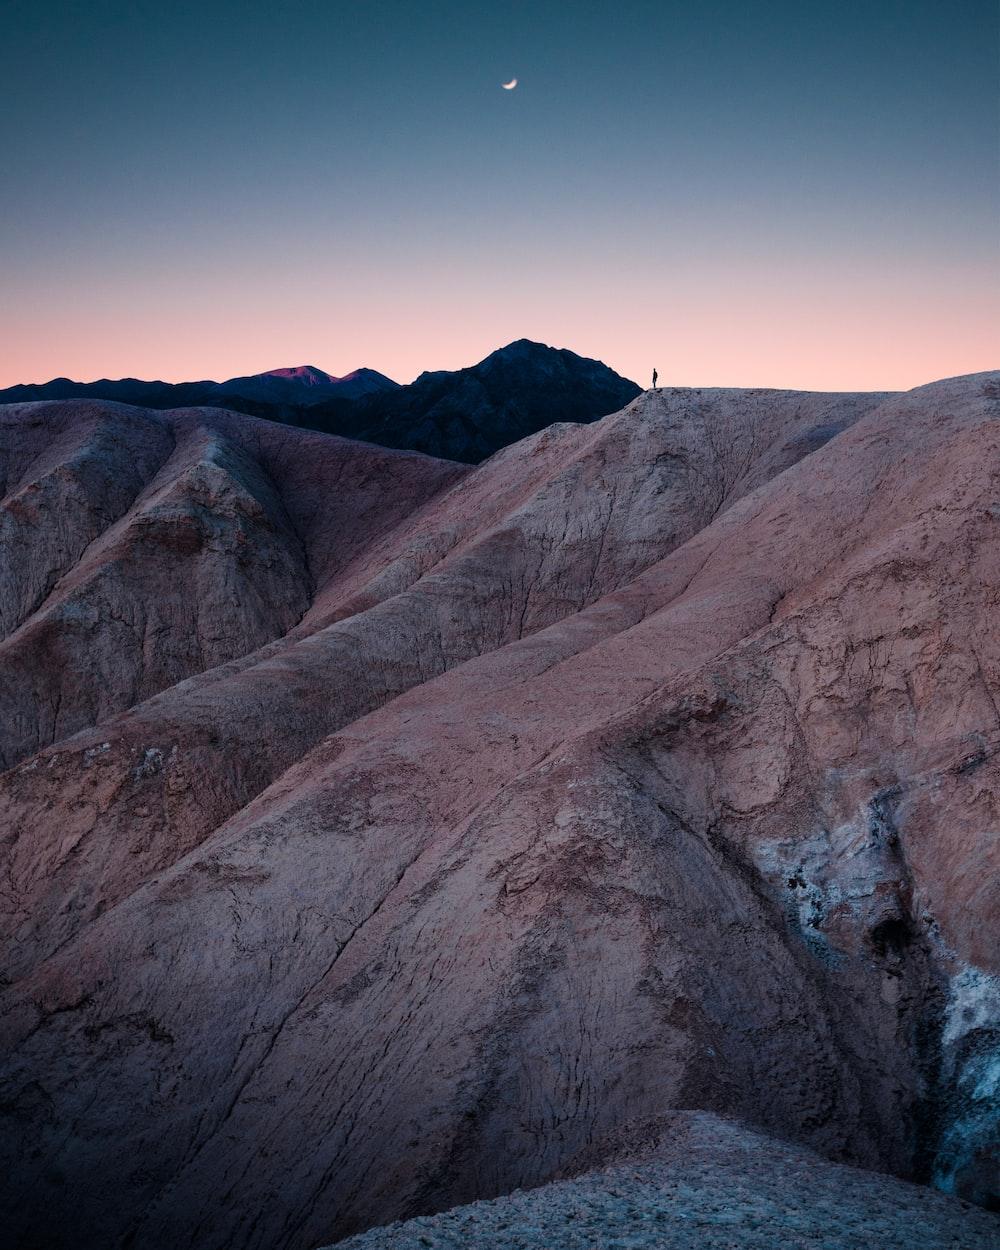 man standing on mountain during daytime